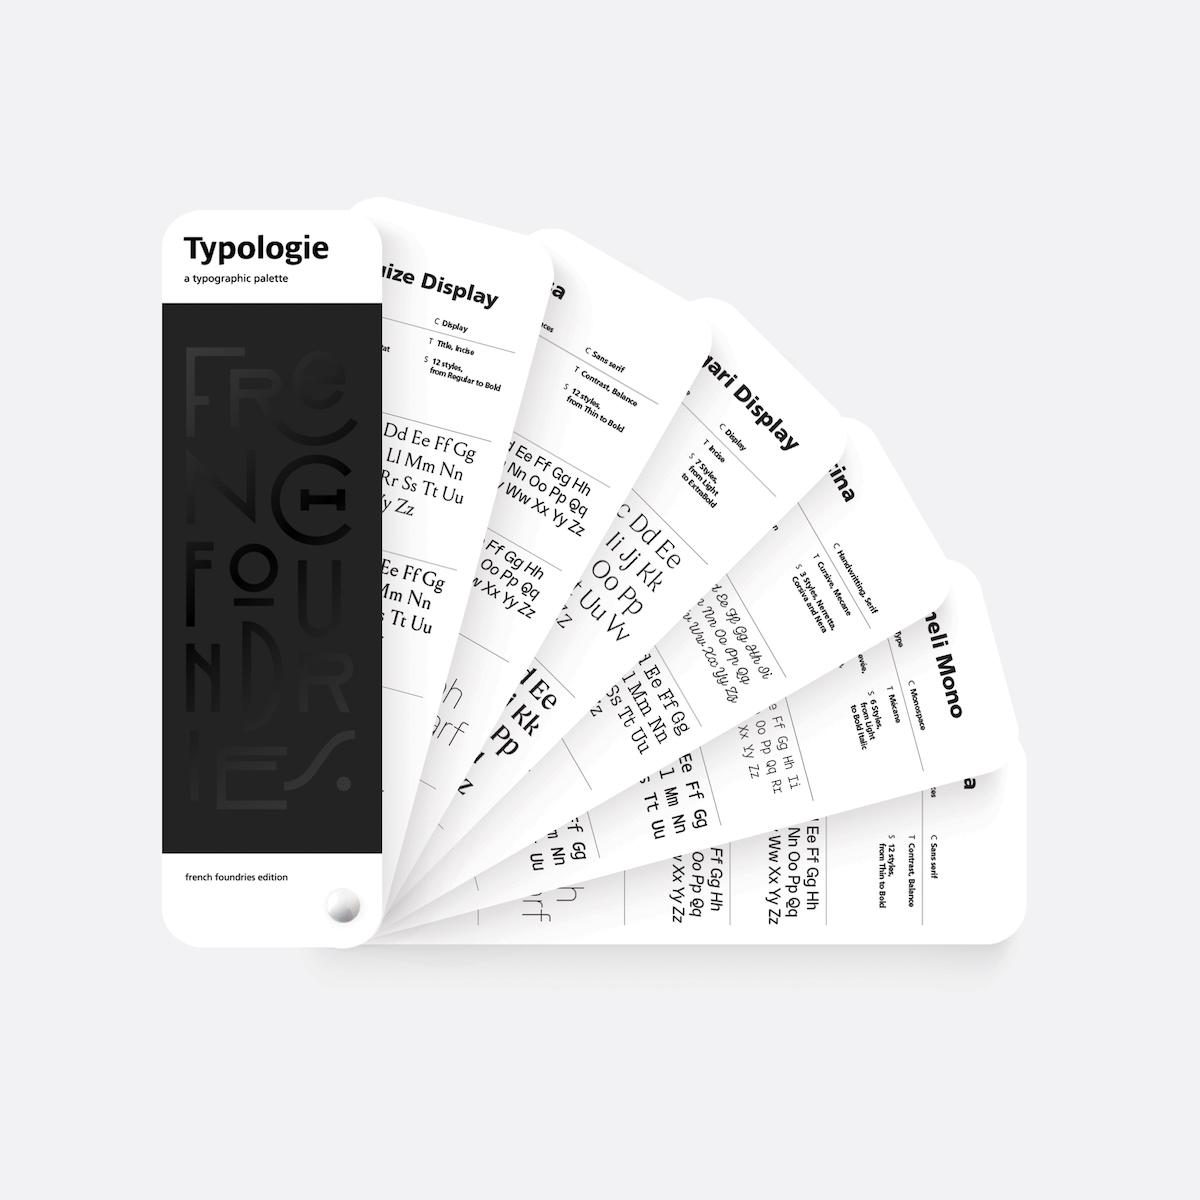 2020-07-01_5efc482655782_TYPOLOGIE-SQUARE